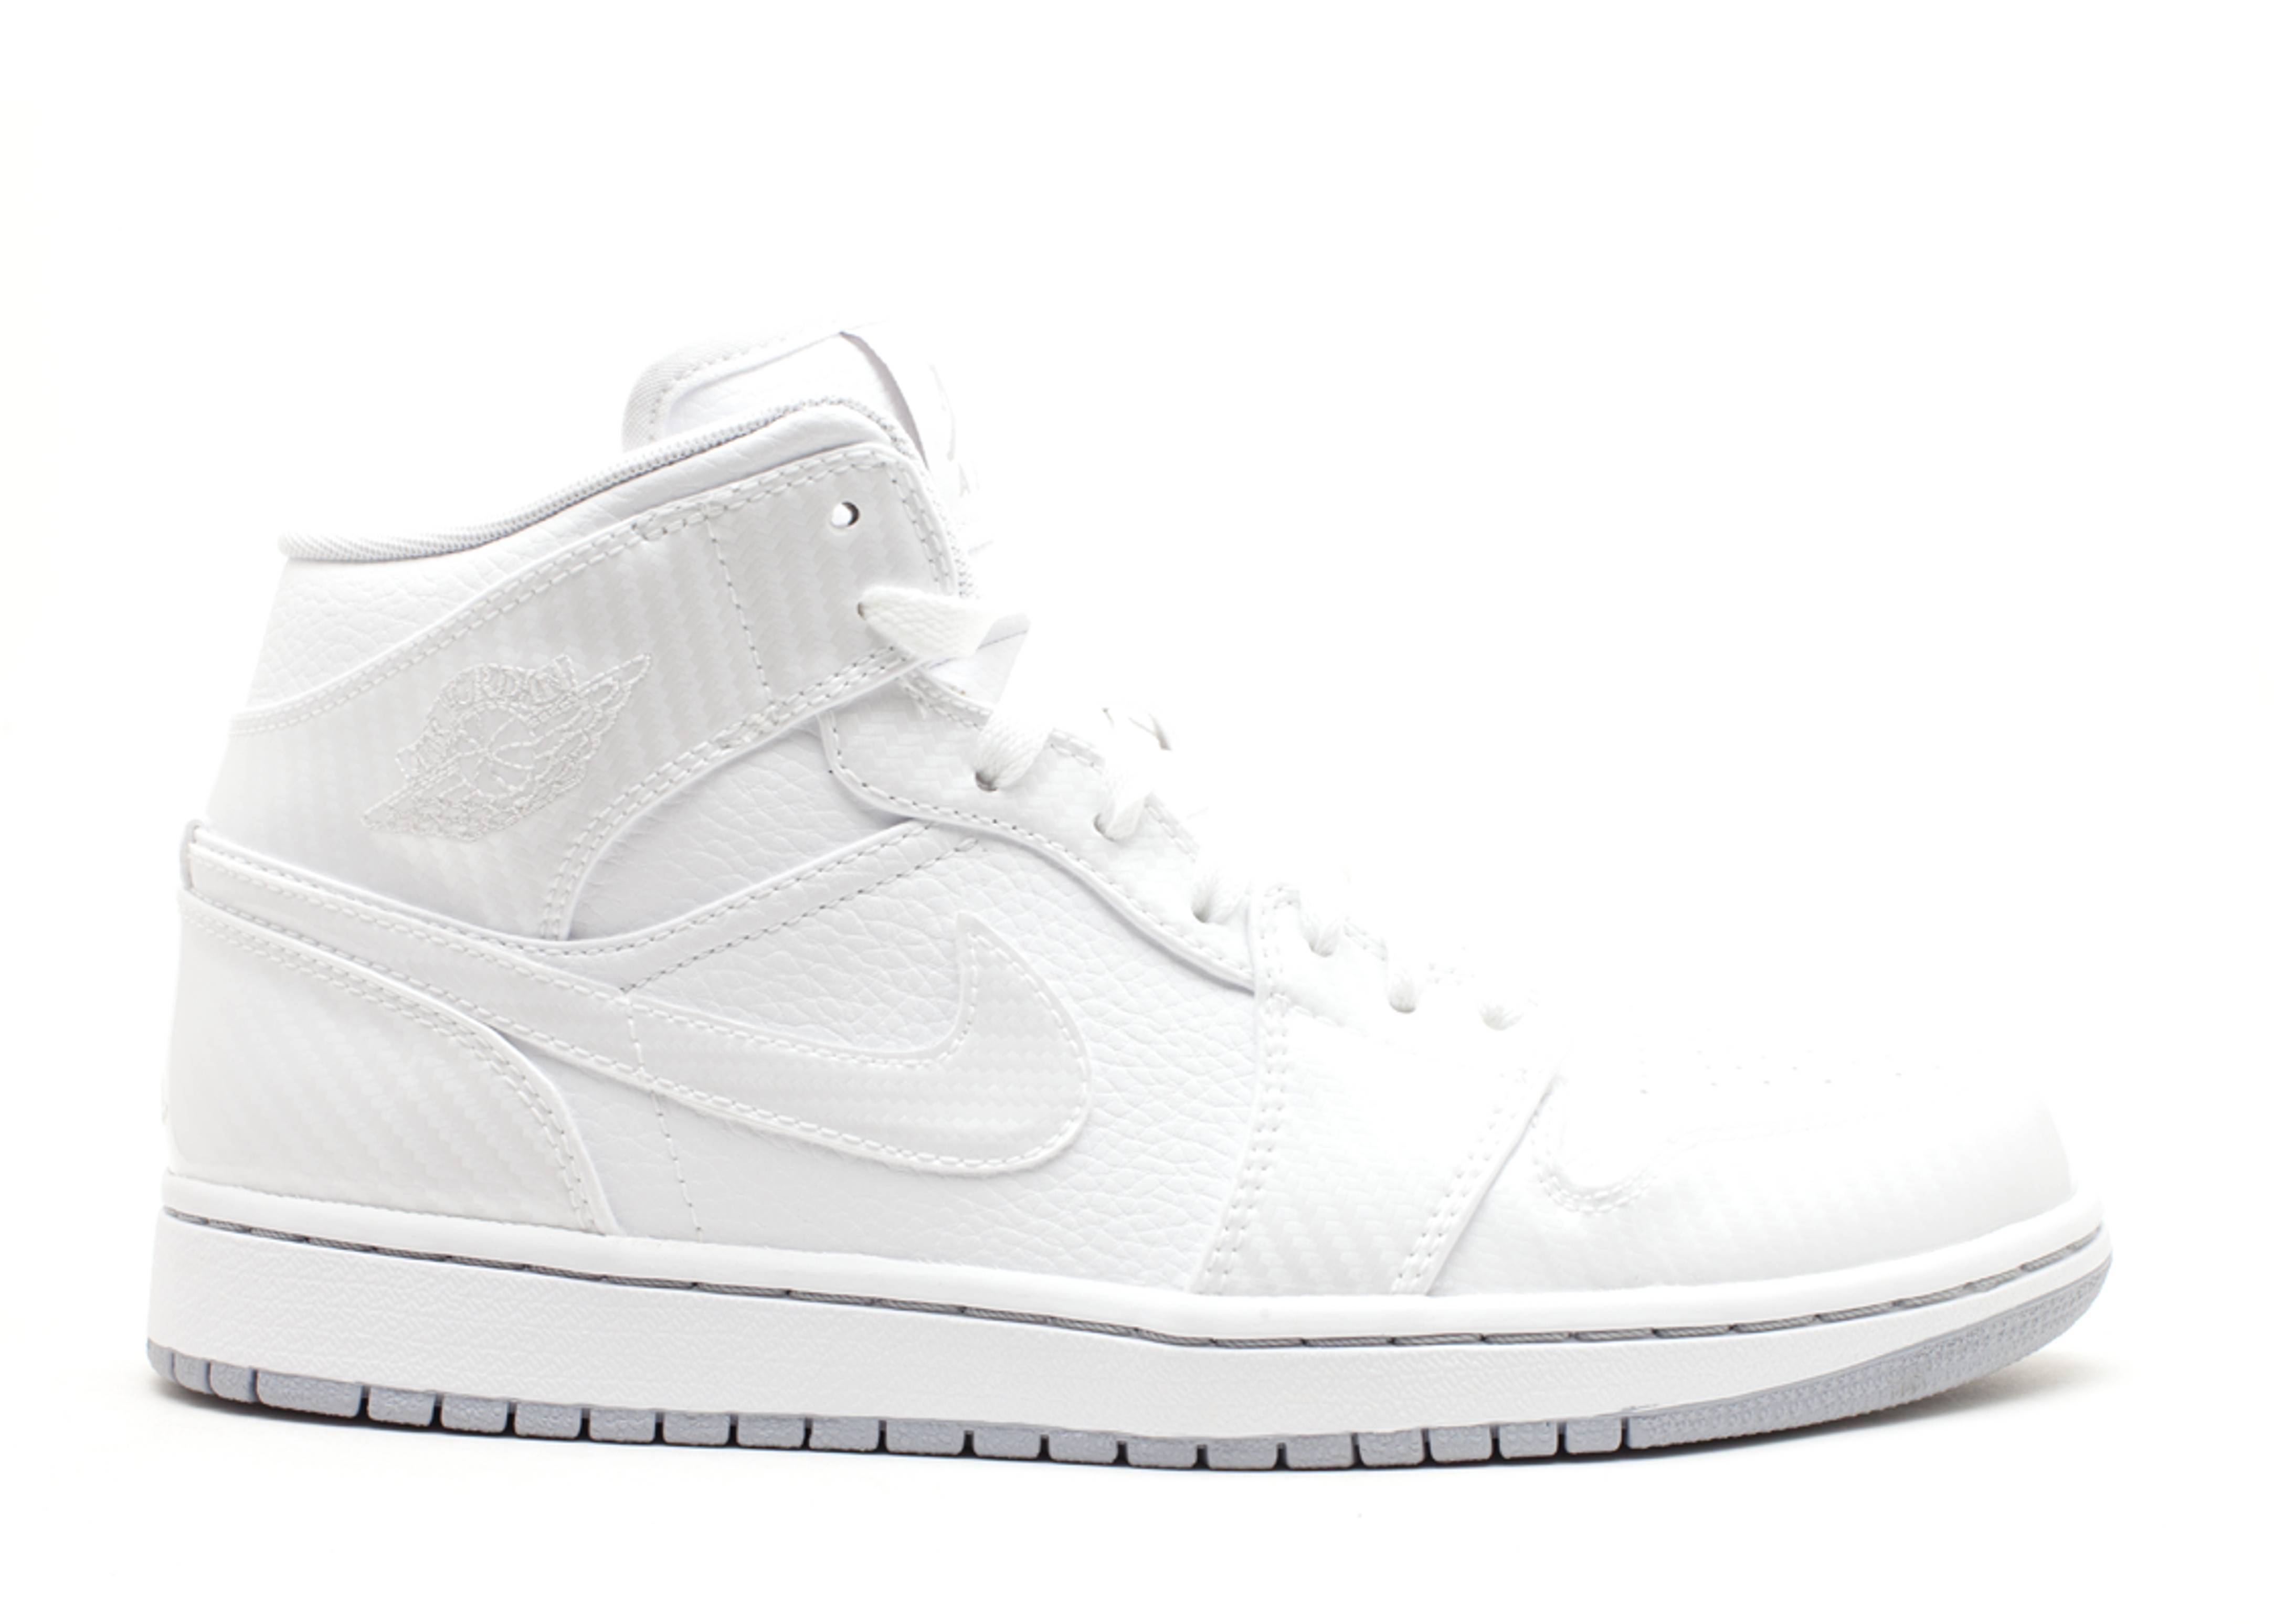 Air Jordan 1 Phat - Air Jordan - 364770 102 - white wolf grey-white ... f89fdfc5dbf9